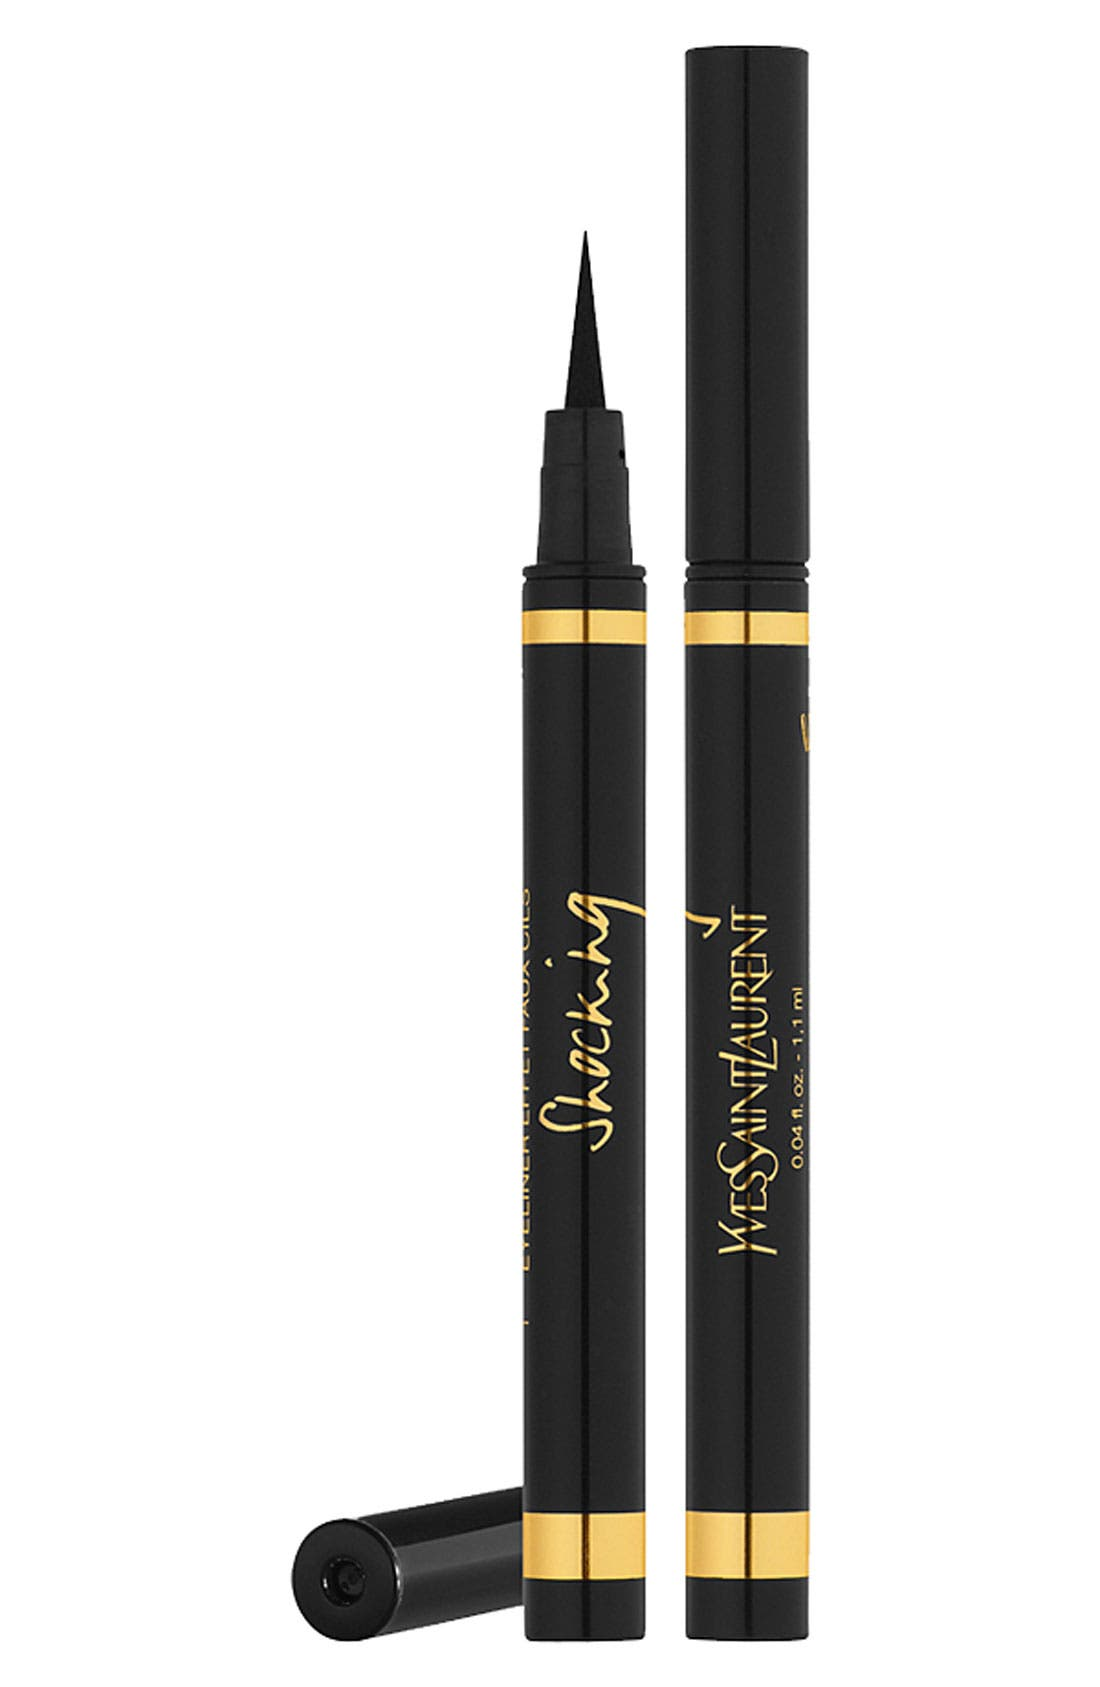 Yves Saint Laurent Eyeliner Effet Faux Cils Bold Felt Tip Eyeliner Pen - No. 01 Black